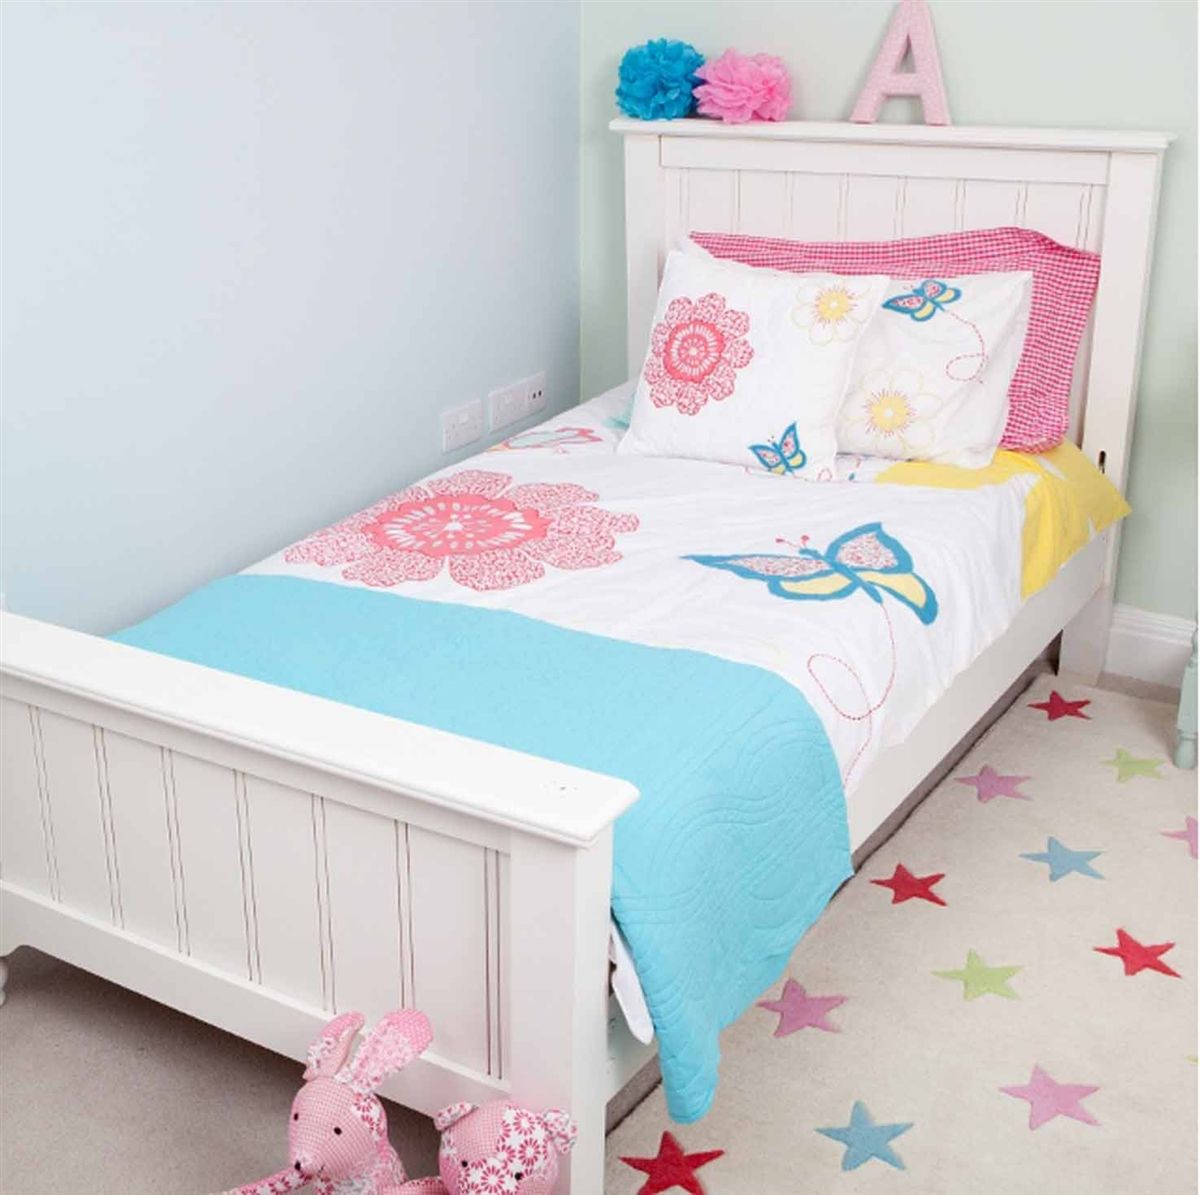 Cot Bed Duvet Cover Daisy Fl